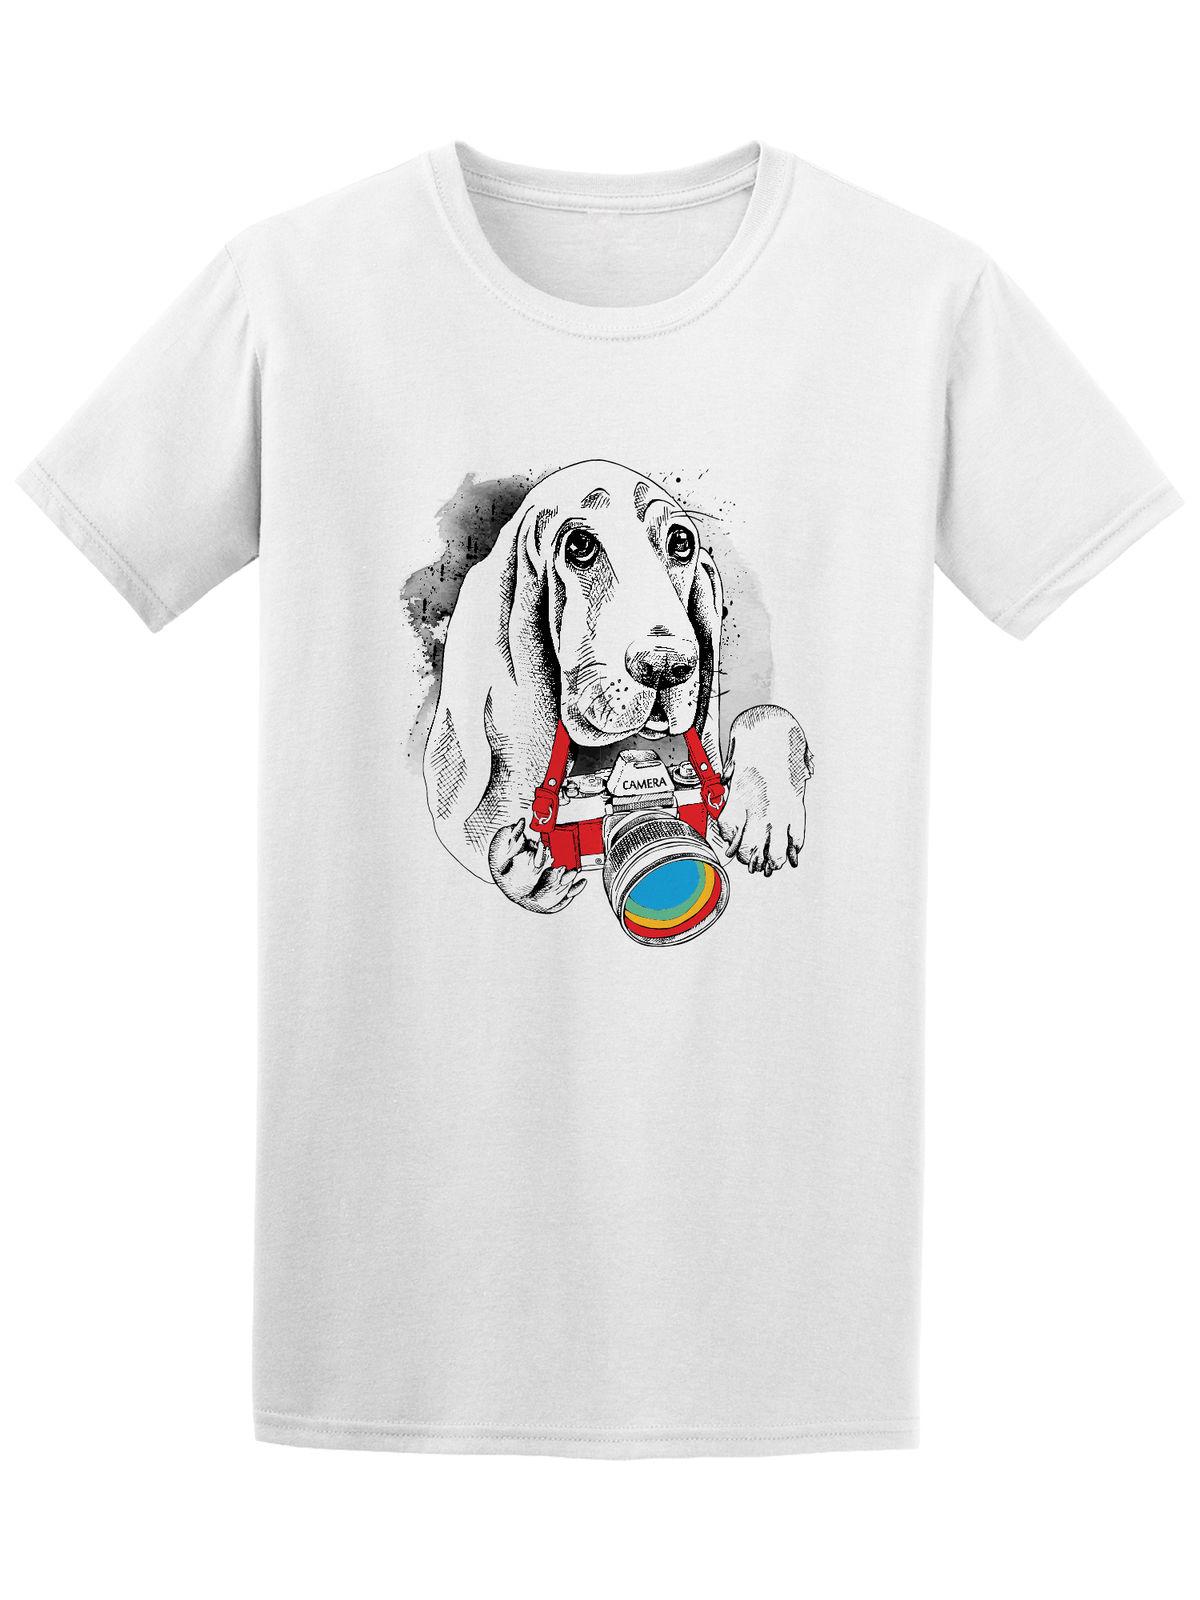 YXQMY Funny Keep Calm German Shepherd Baby Casual Round Neck Tee Shirts Short eeve T